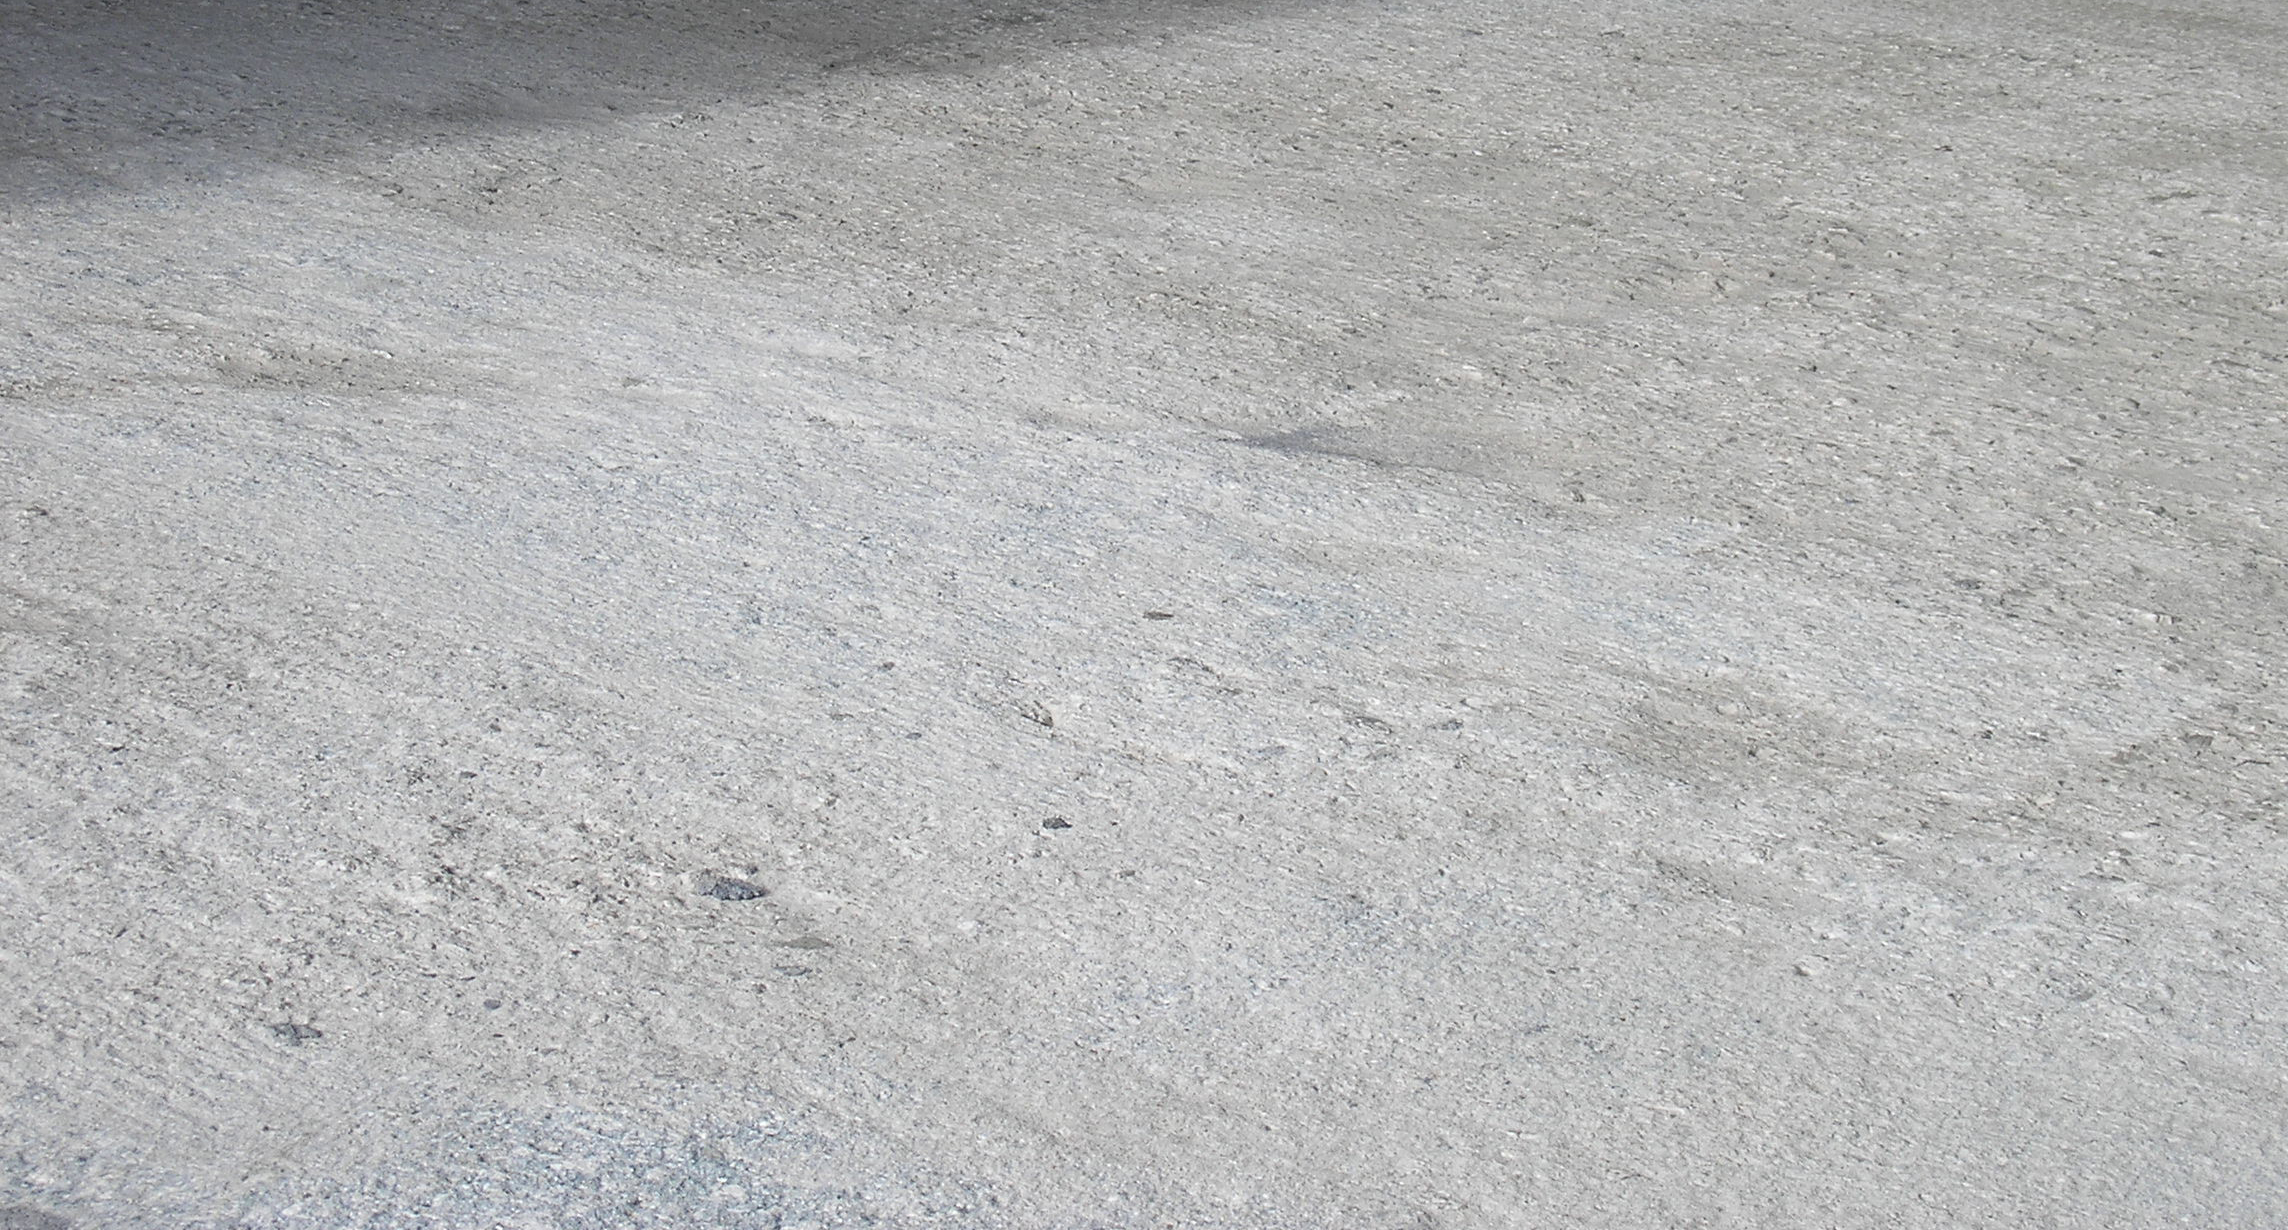 Repairing Rain Or Water Damaged Concrete Slabs Arcon